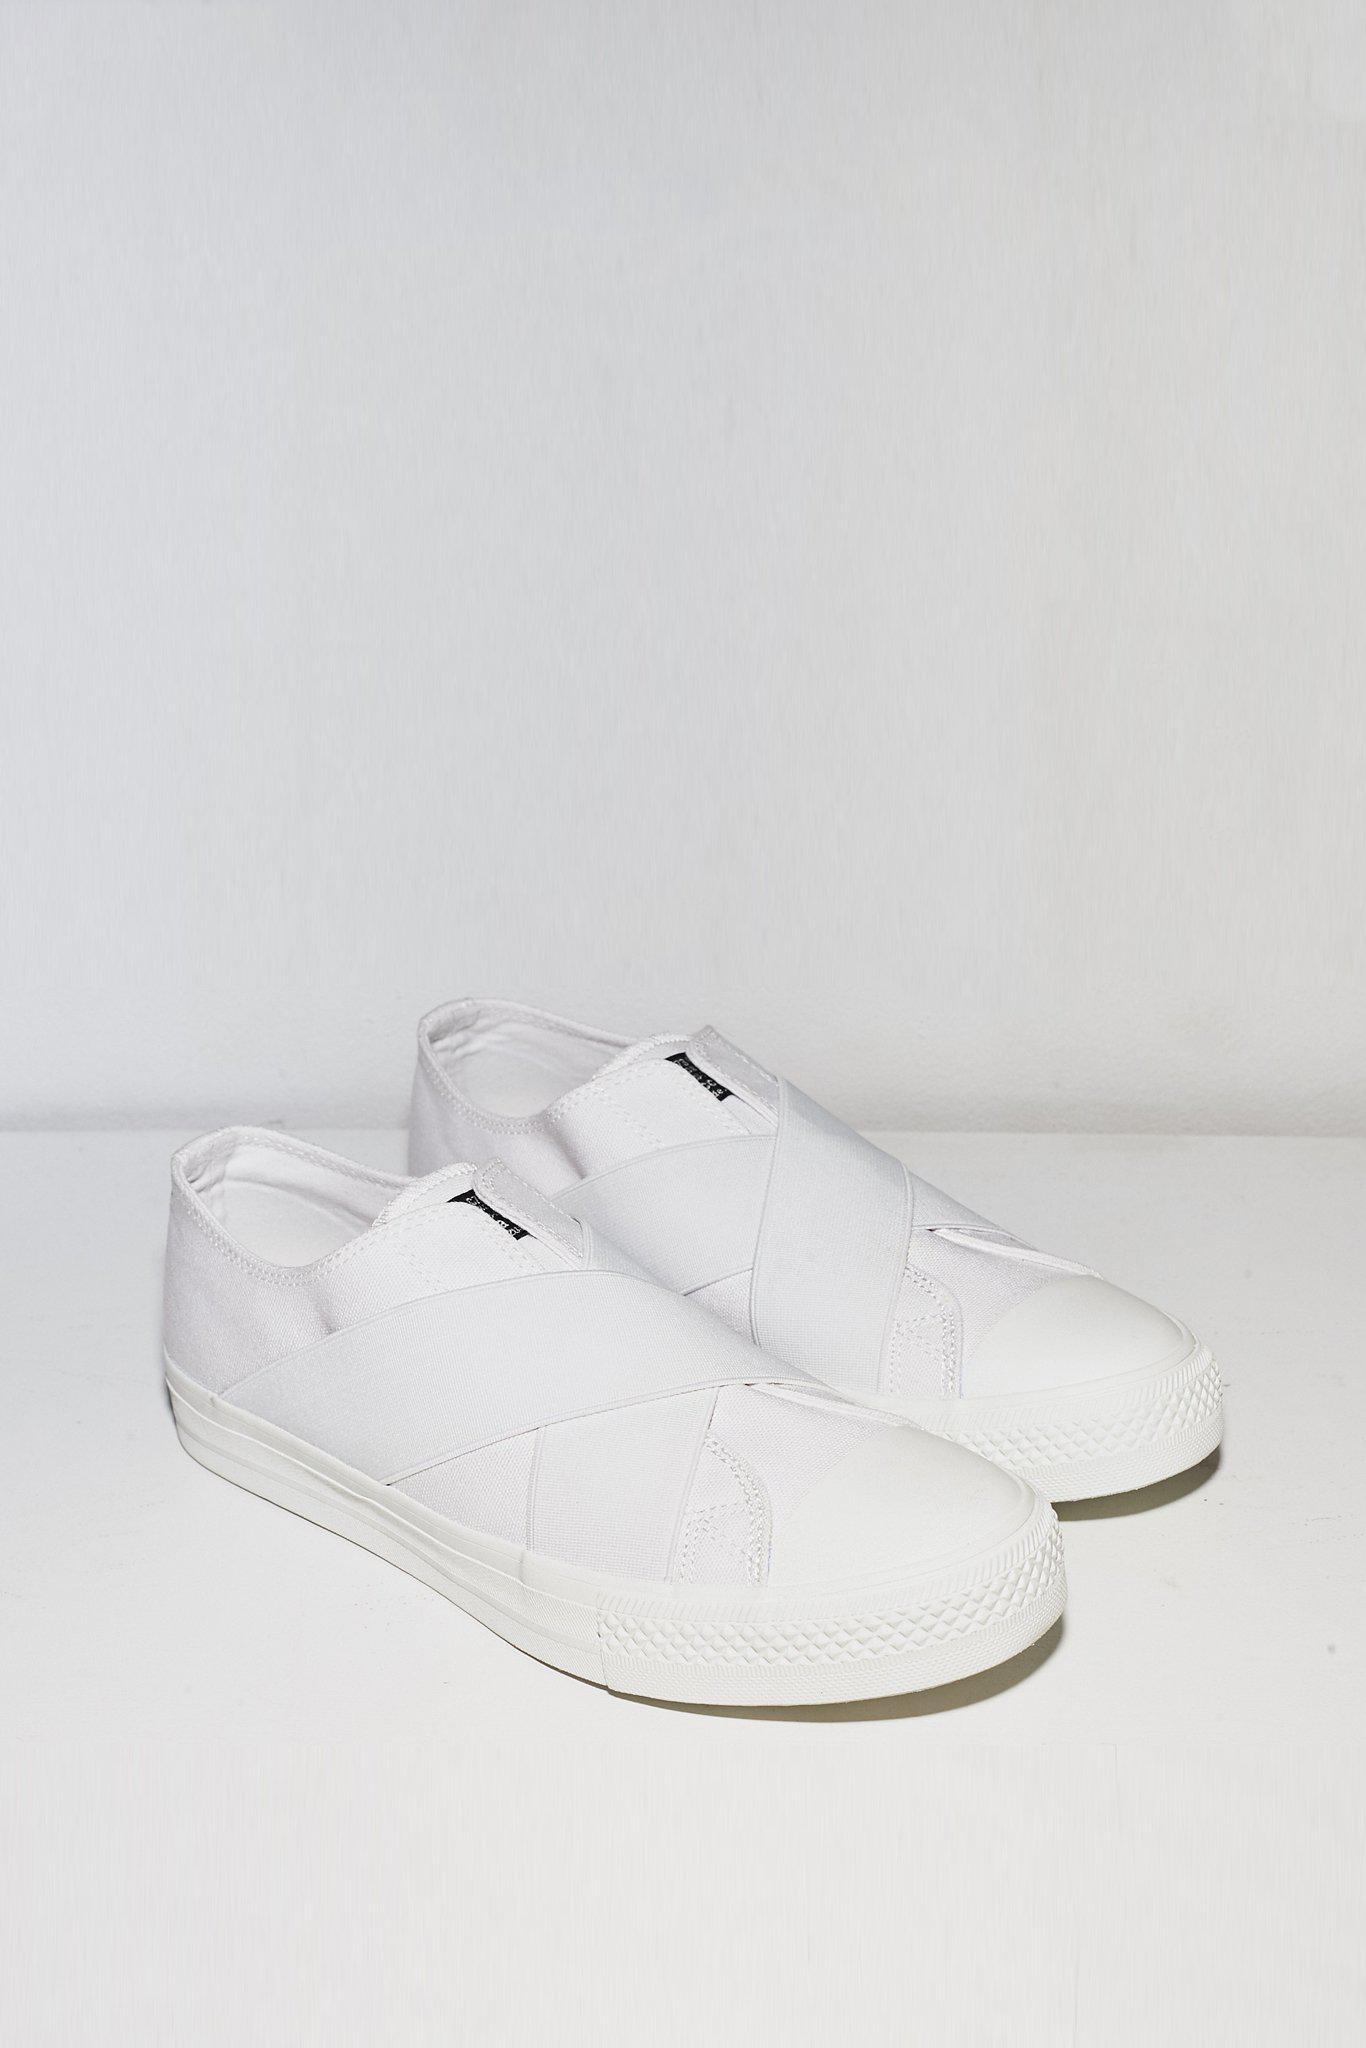 Zucca Womens Low Cut Belted Sneaker - White